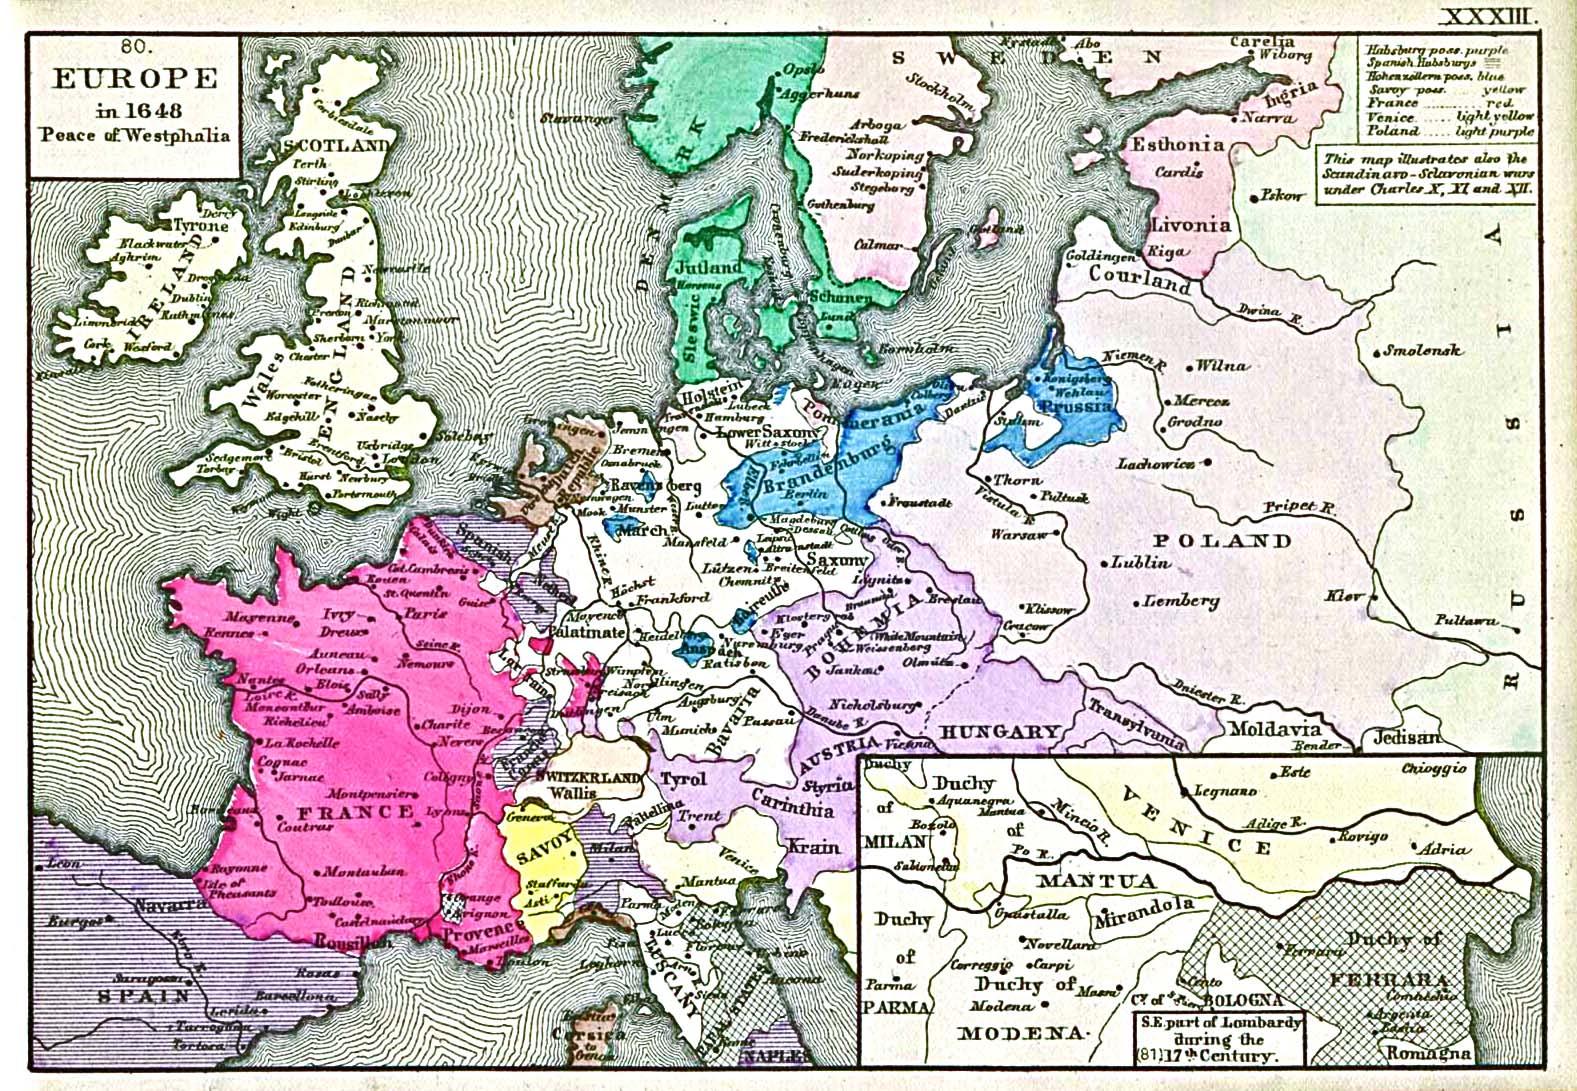 European state boundaries post-Westphalia.